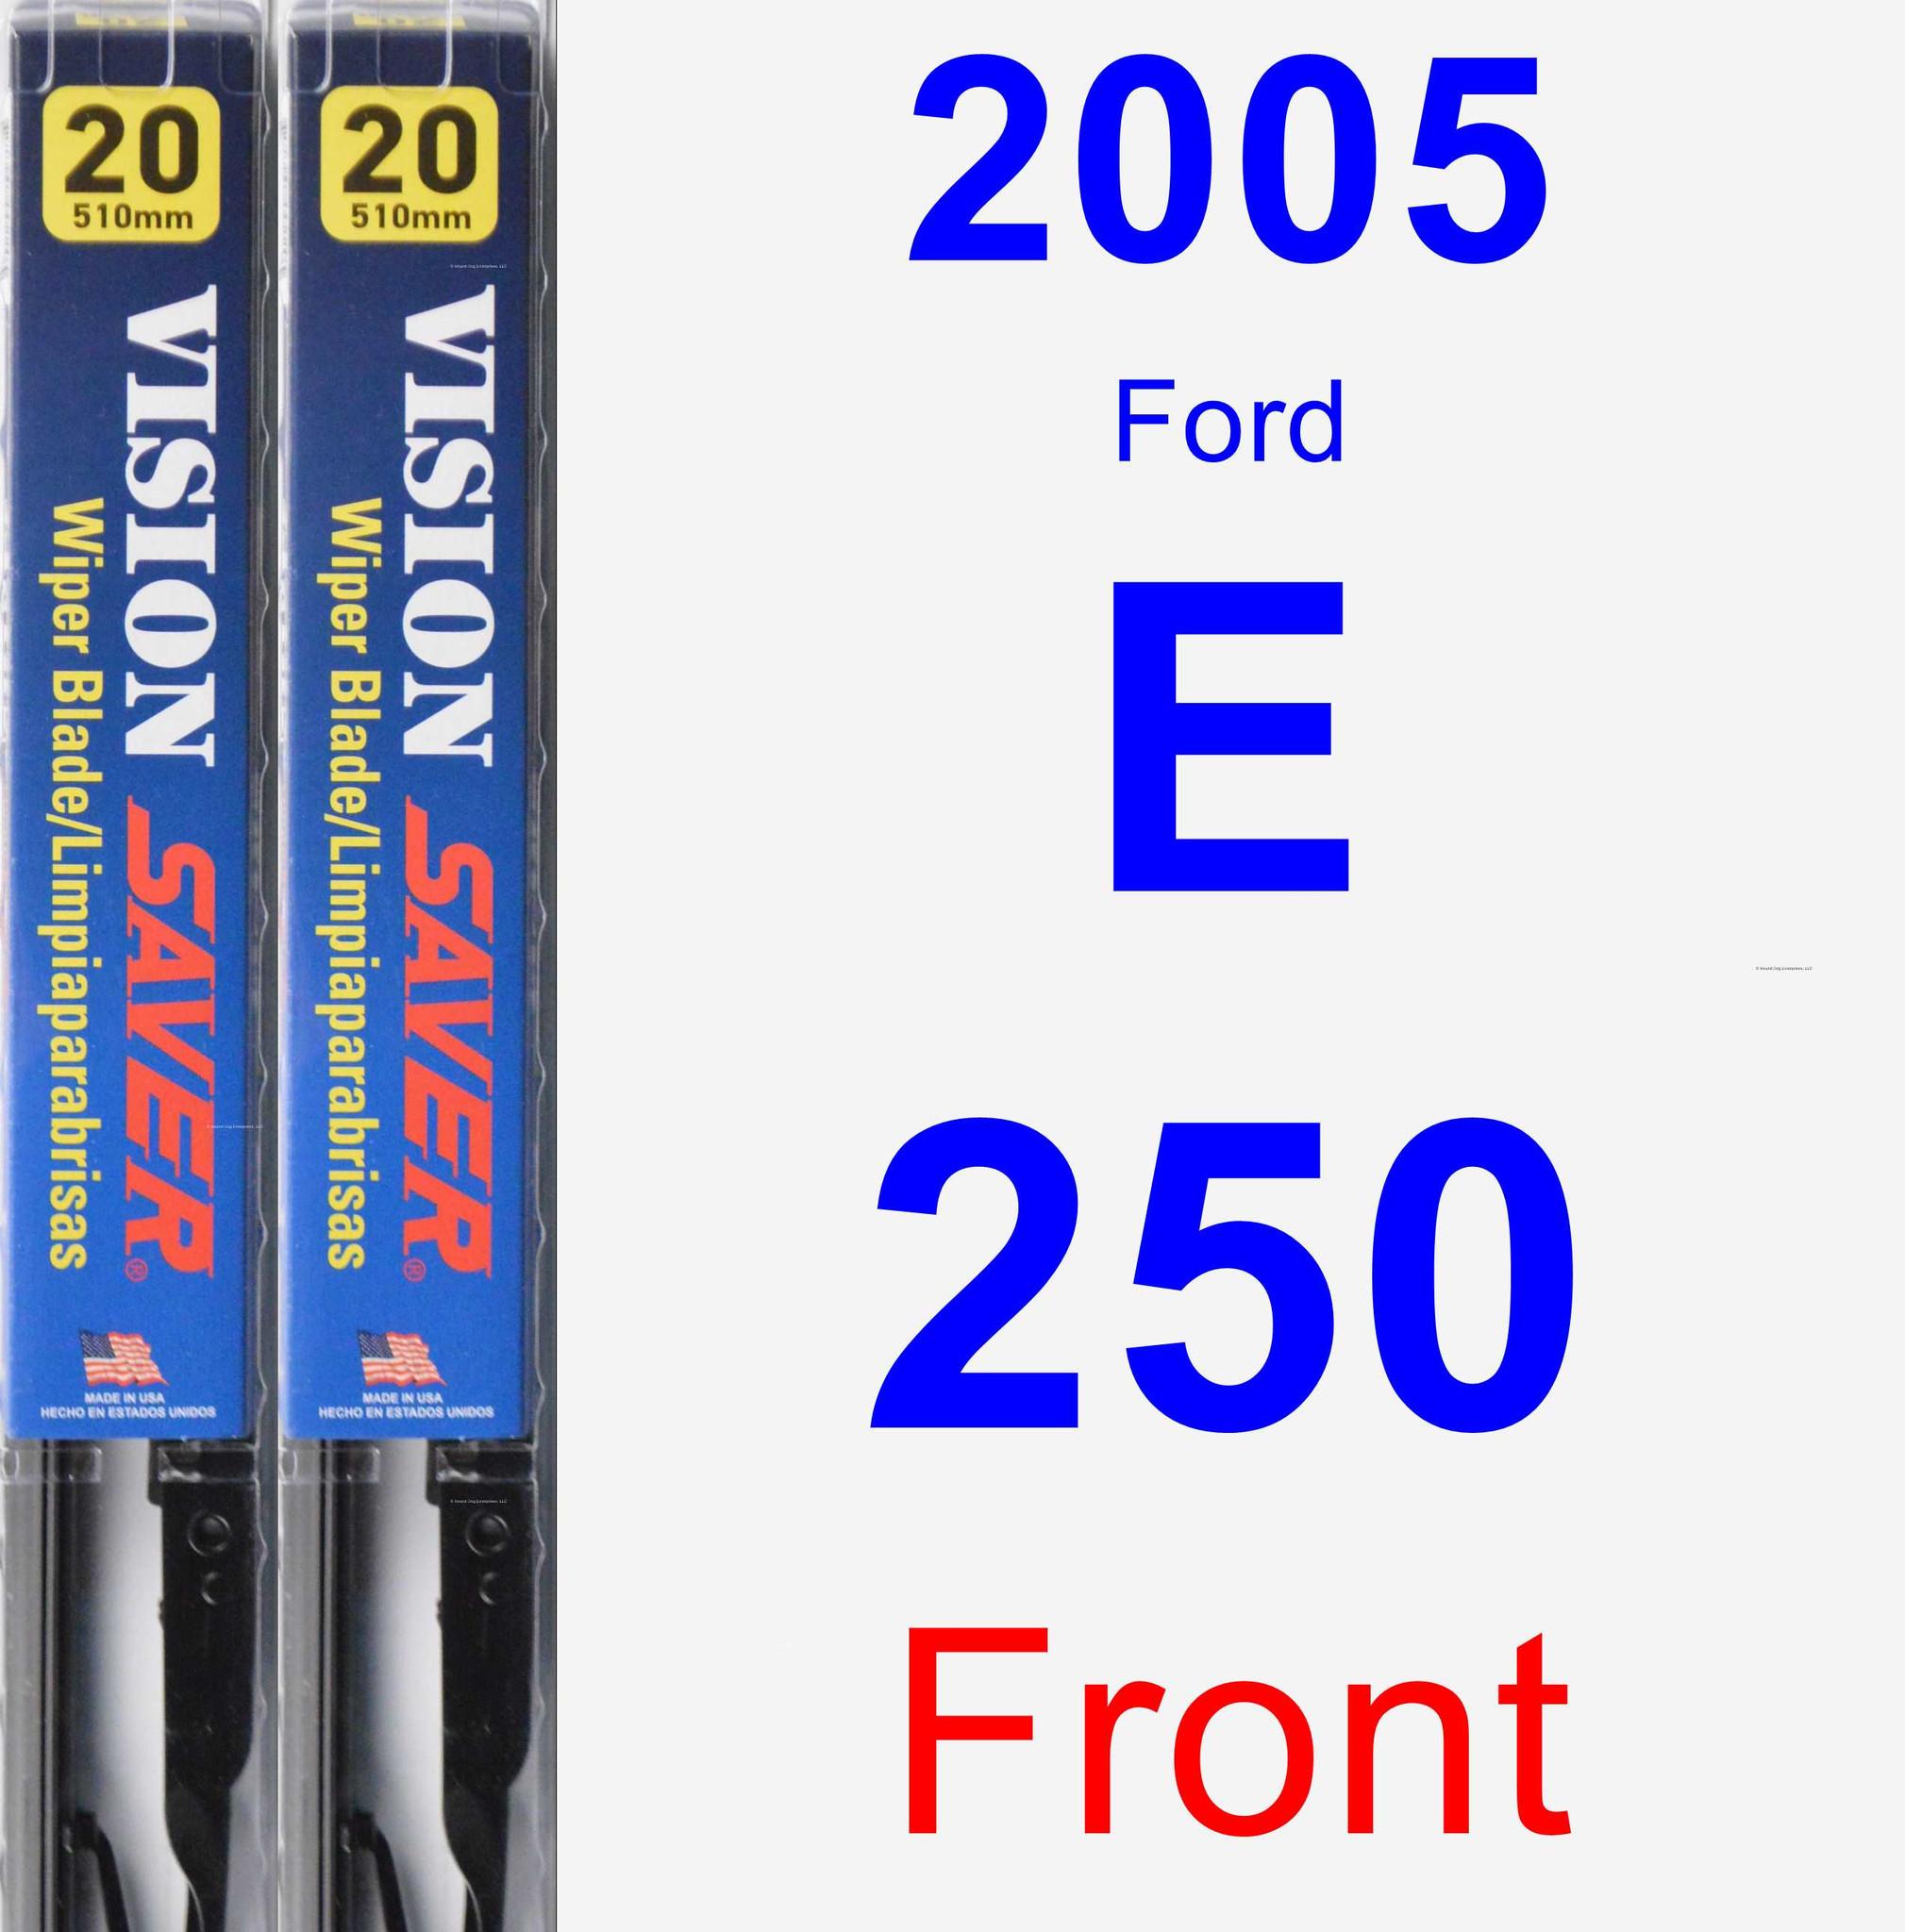 2005 Ford E-250 Wiper Blade Set/Kit (Front) (2 Blades) - Vision Saver